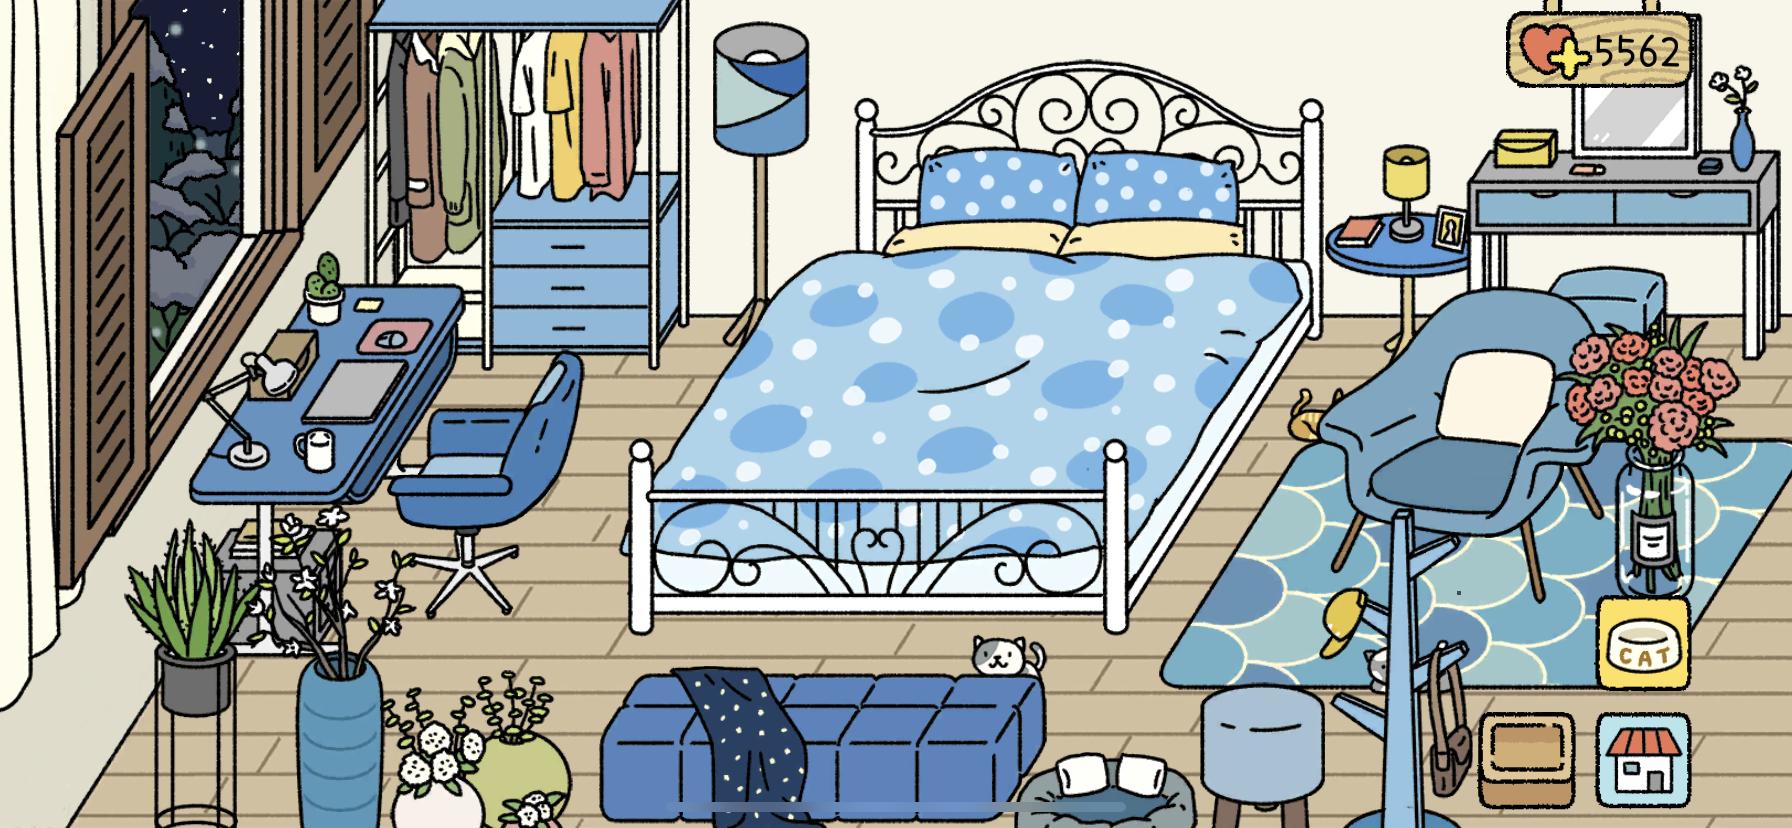 Adorable Home Game Decoration Ideas Trong 2020 Thiết Kế động Vật